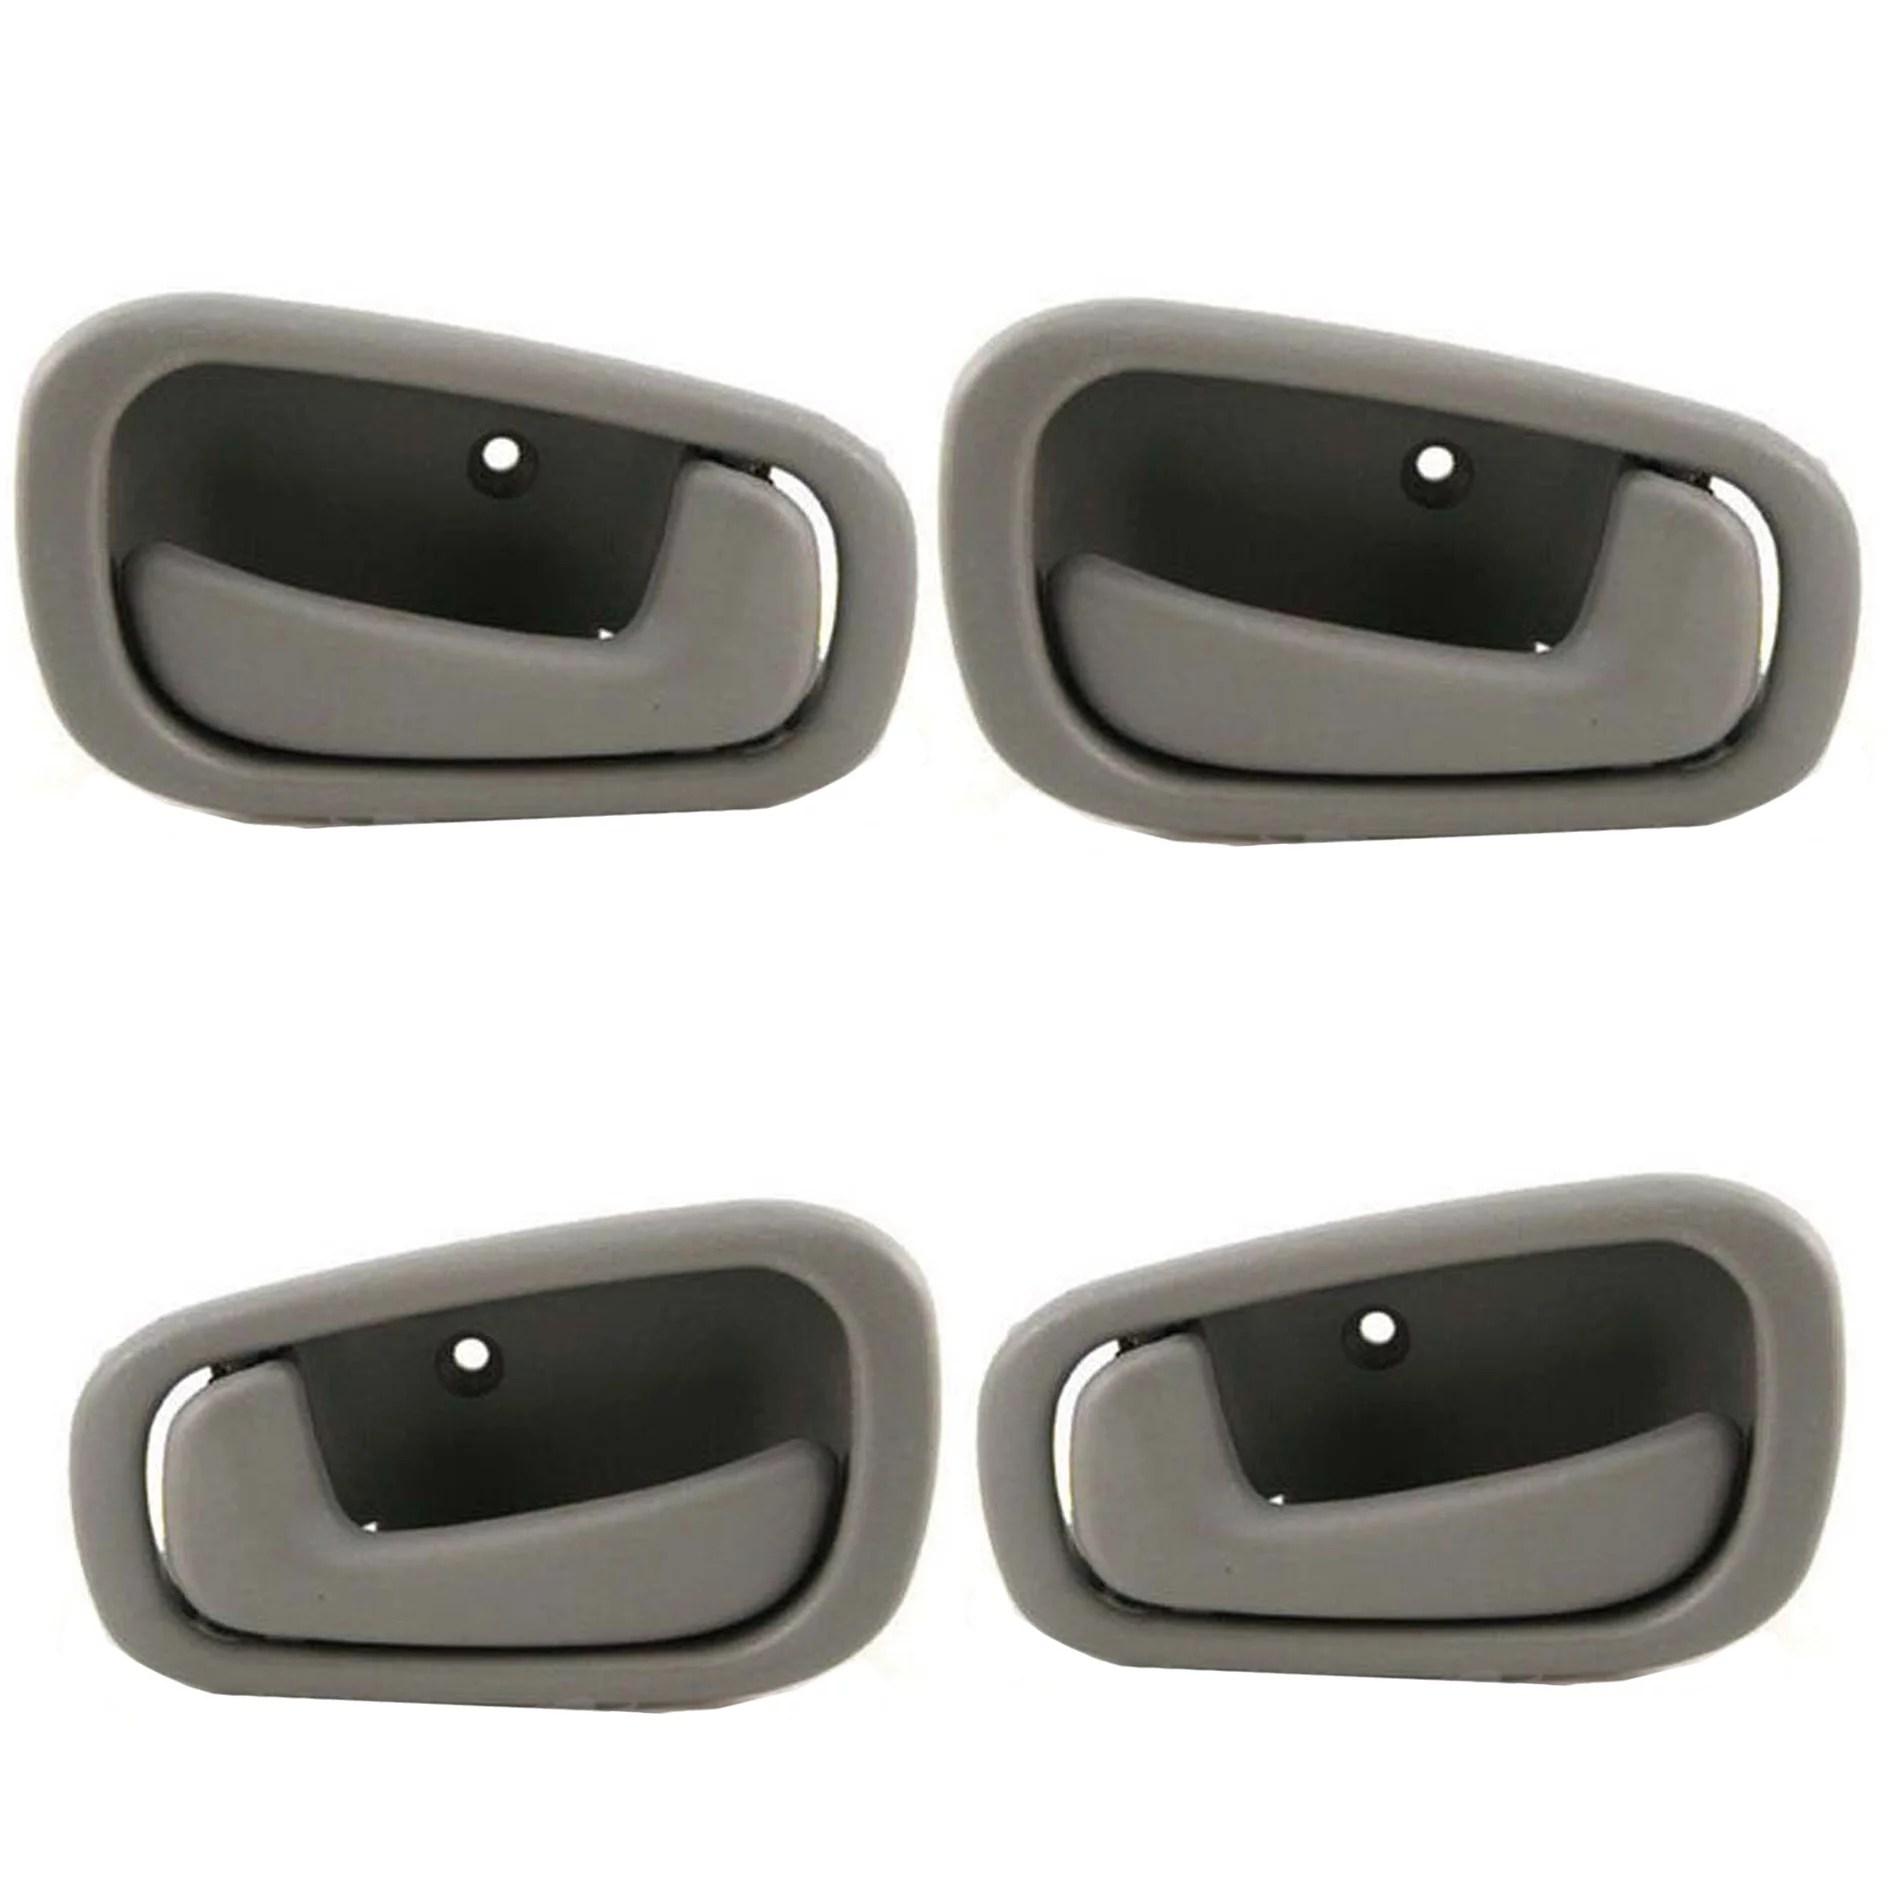 hight resolution of for 98 02 chevrolet prizm toyota corolla gray interior inner door handle 4pcs full set 98 99 00 01 02 dh44 walmart com